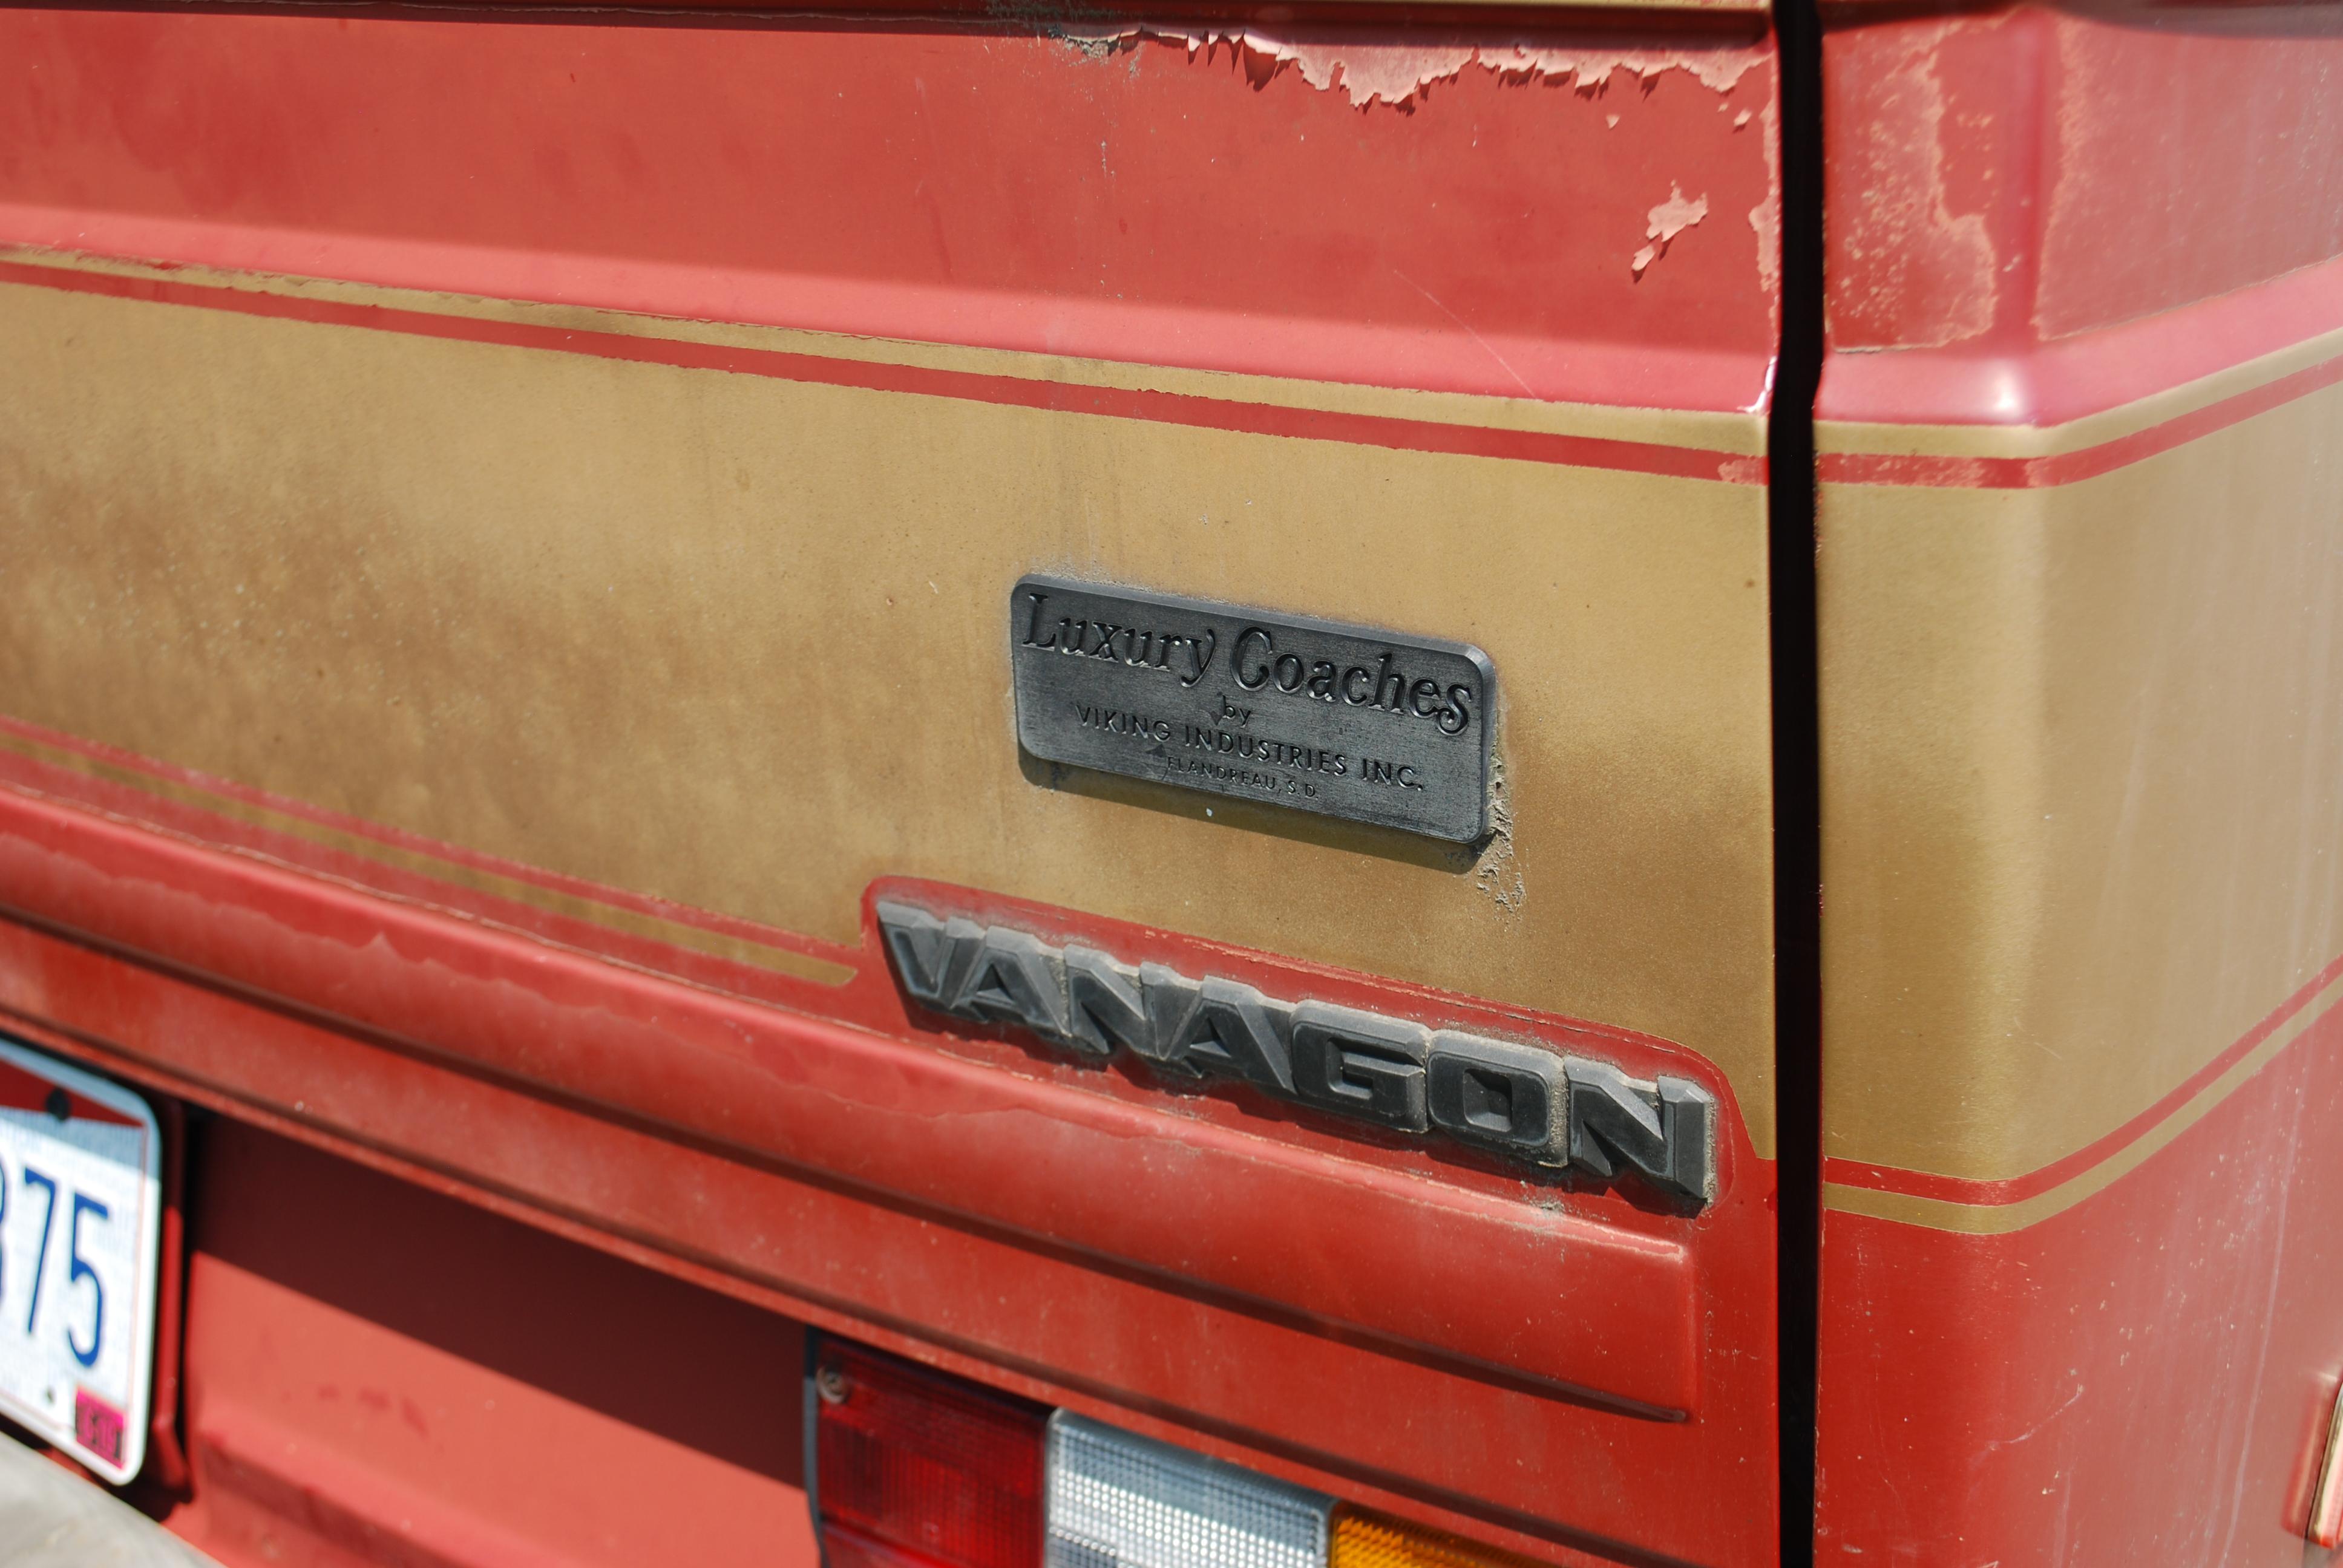 McLaren570SvsAudiR8V10Plus Comparison00002 600x300 photo